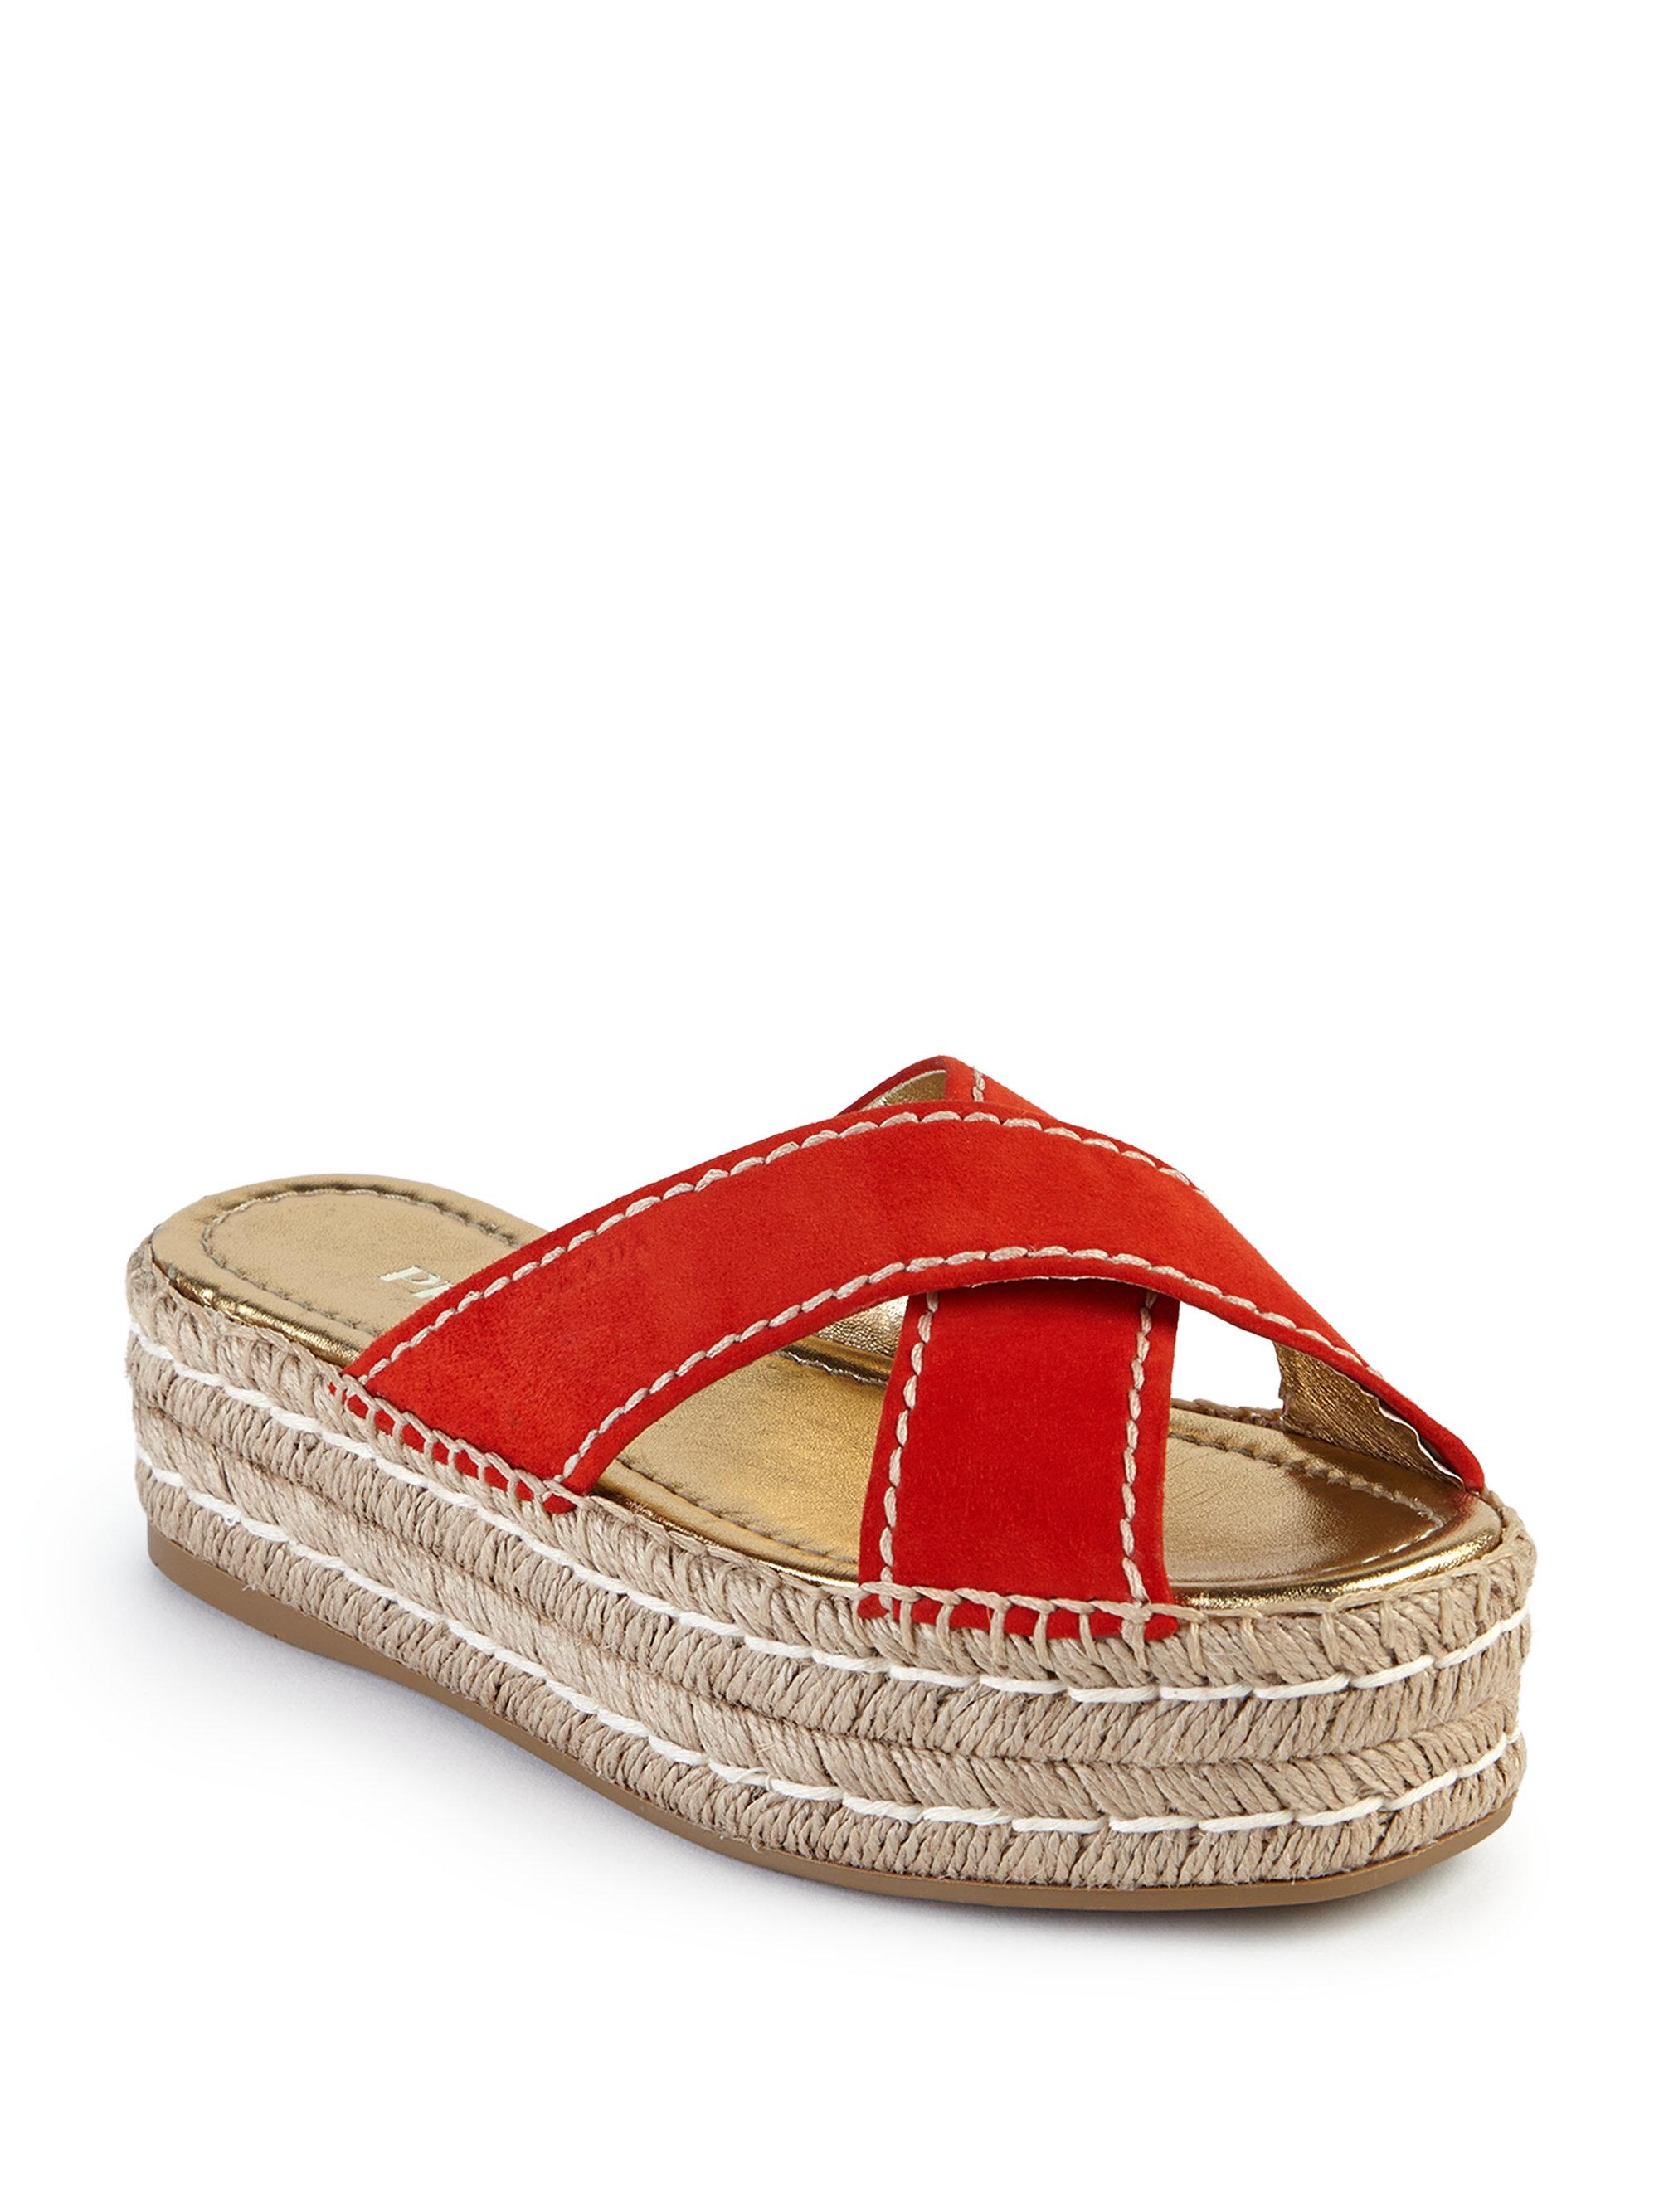 Prada Suede Double Platform Espadrille Slide Sandals In